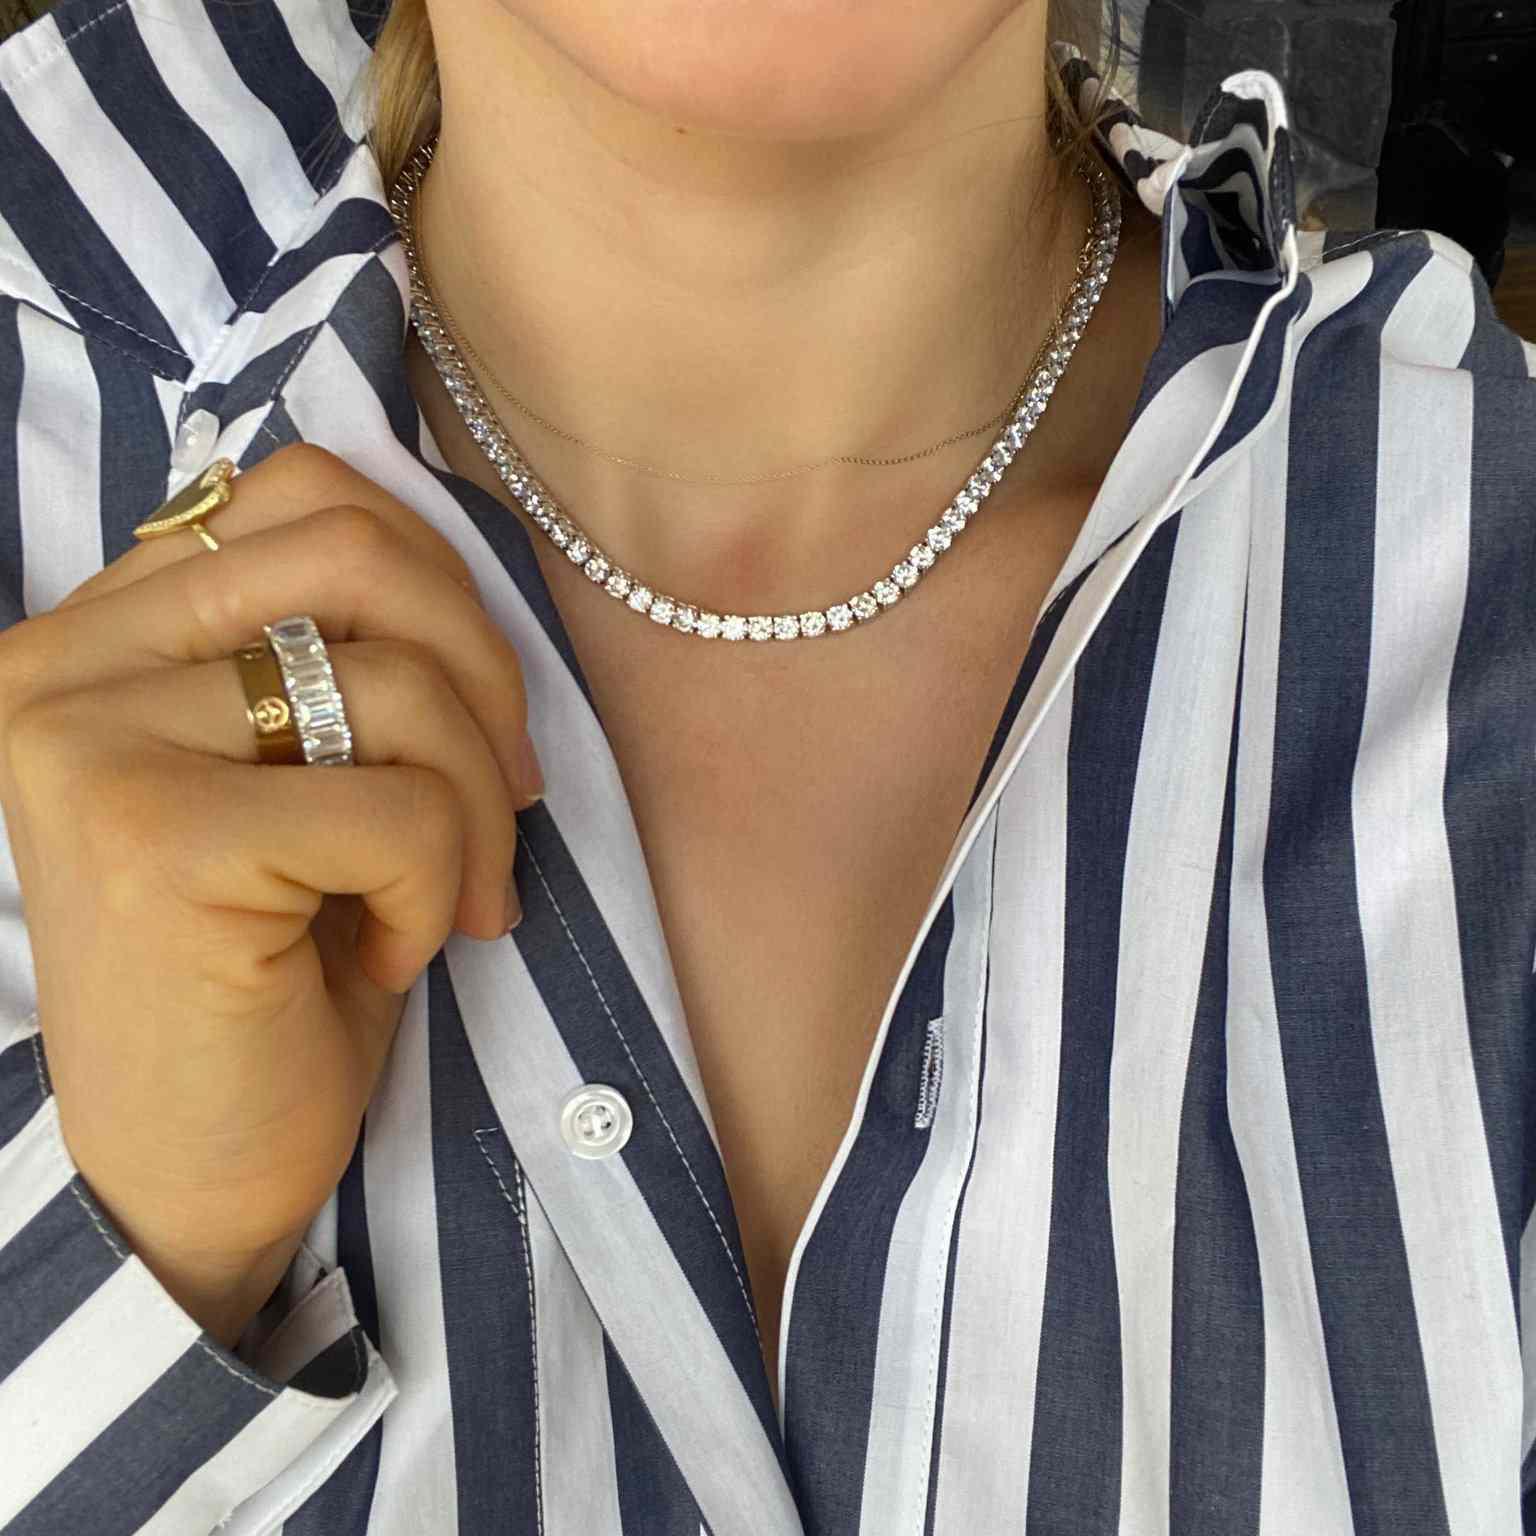 townhouse madison necklace